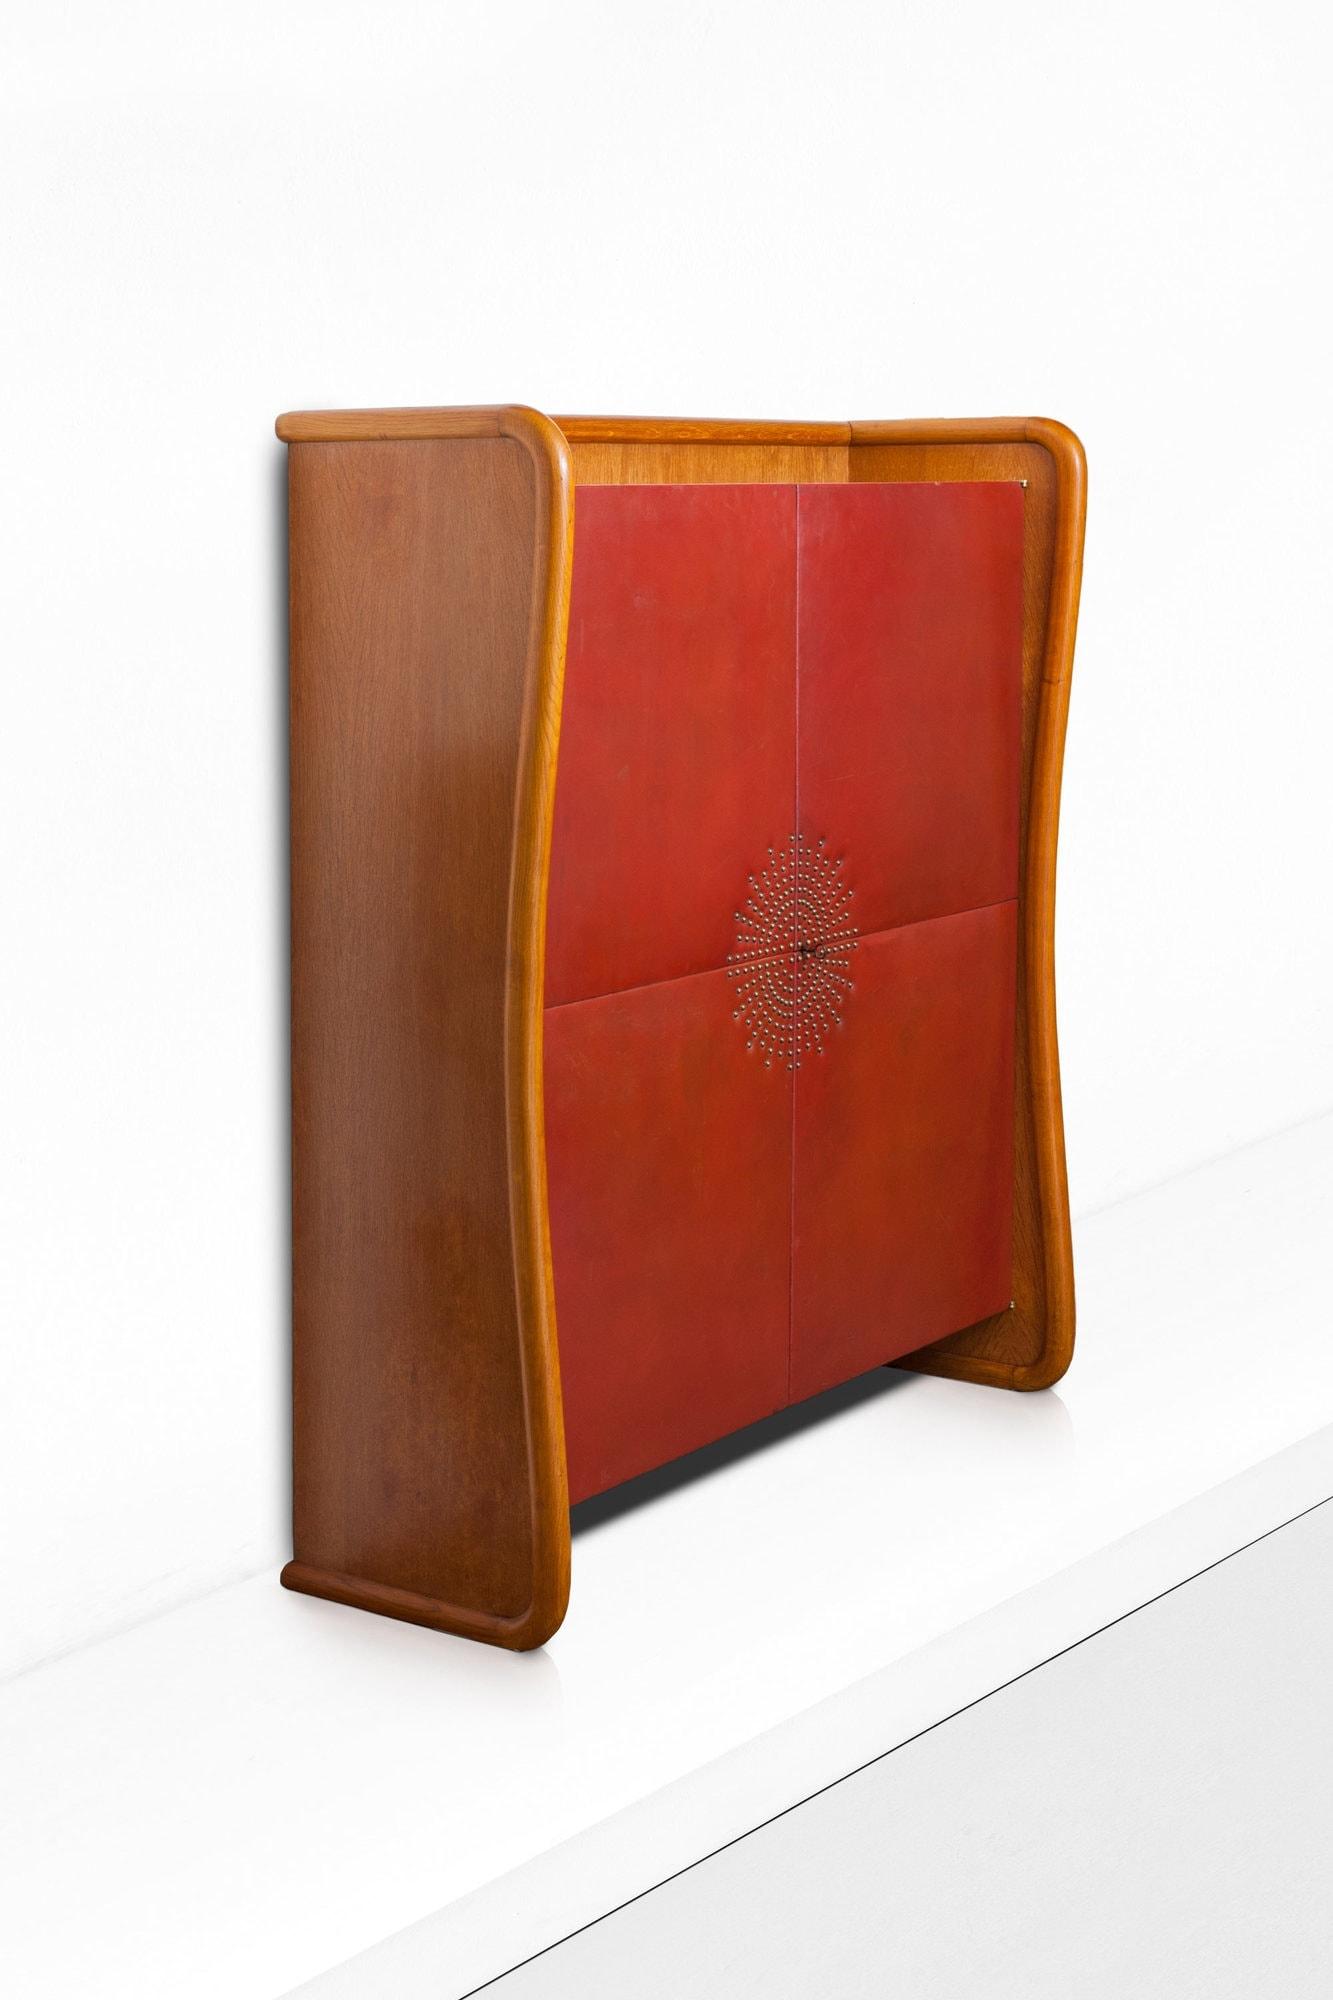 Jean Royère, Rare and elegant cabinet, vue 01